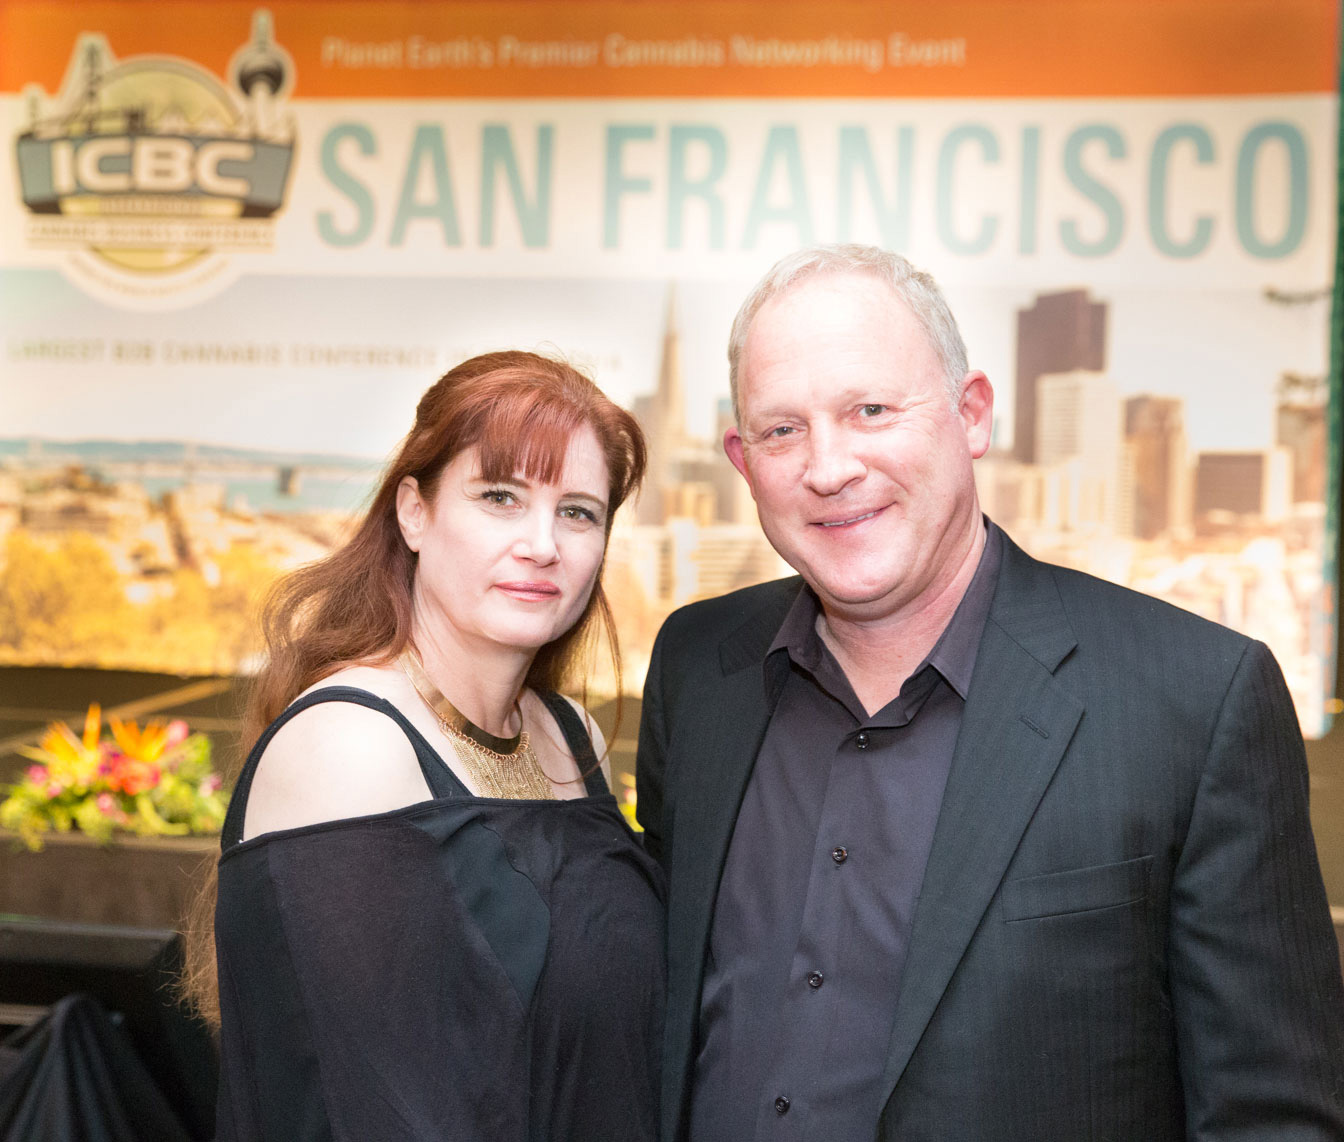 InternationalCBC-San-Francisco-2020-35